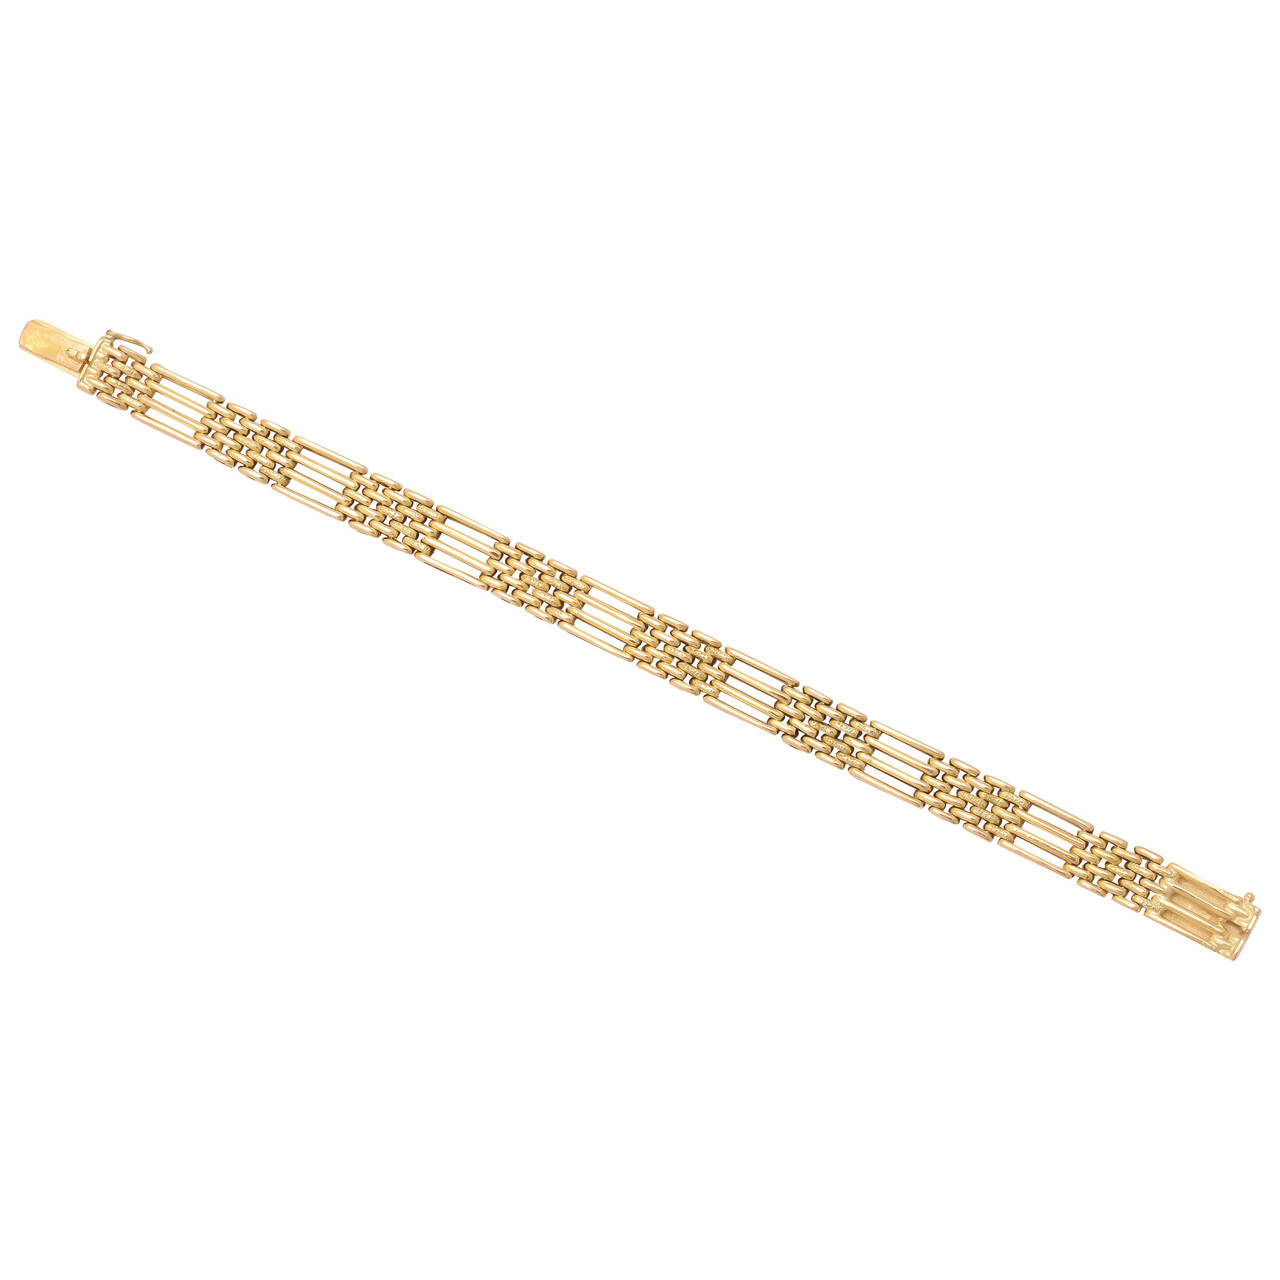 Russian Gold Bracelet, circa 1900 1